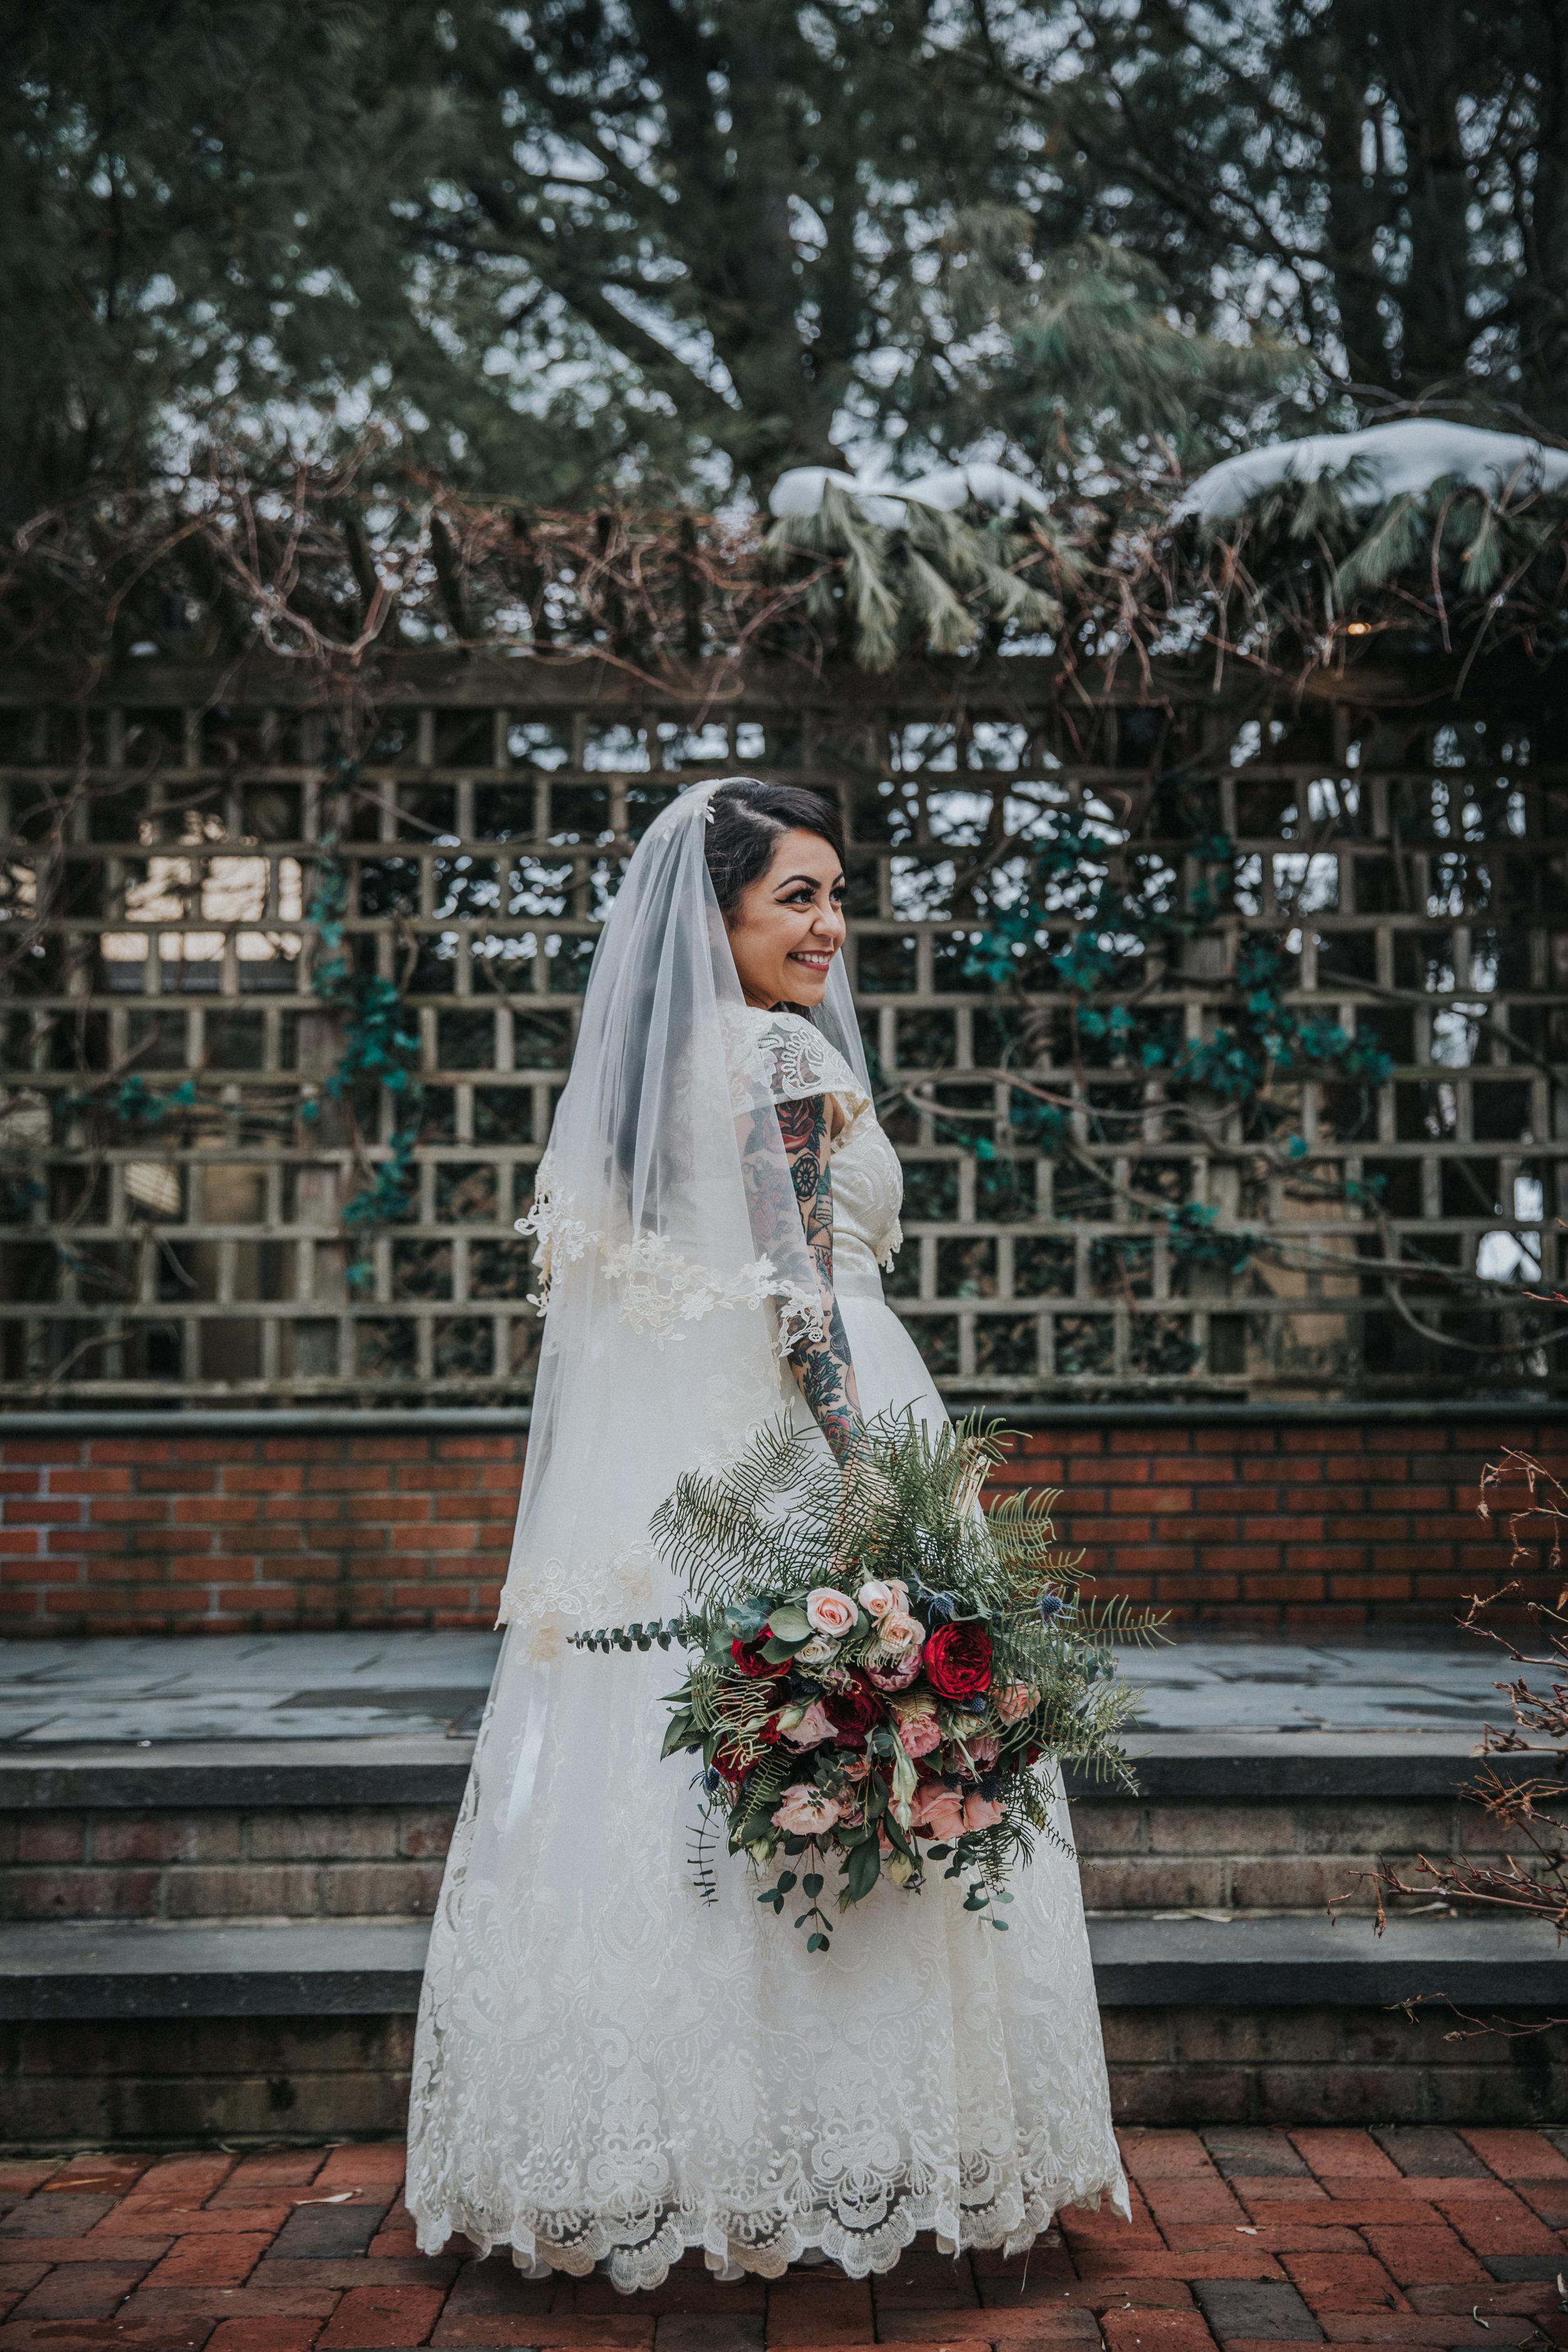 New-Jersey-Wedding-Photographer-ReceptionCenter-Valeria&Mike-First-Look-Bride&Groom (77 of 2).jpg